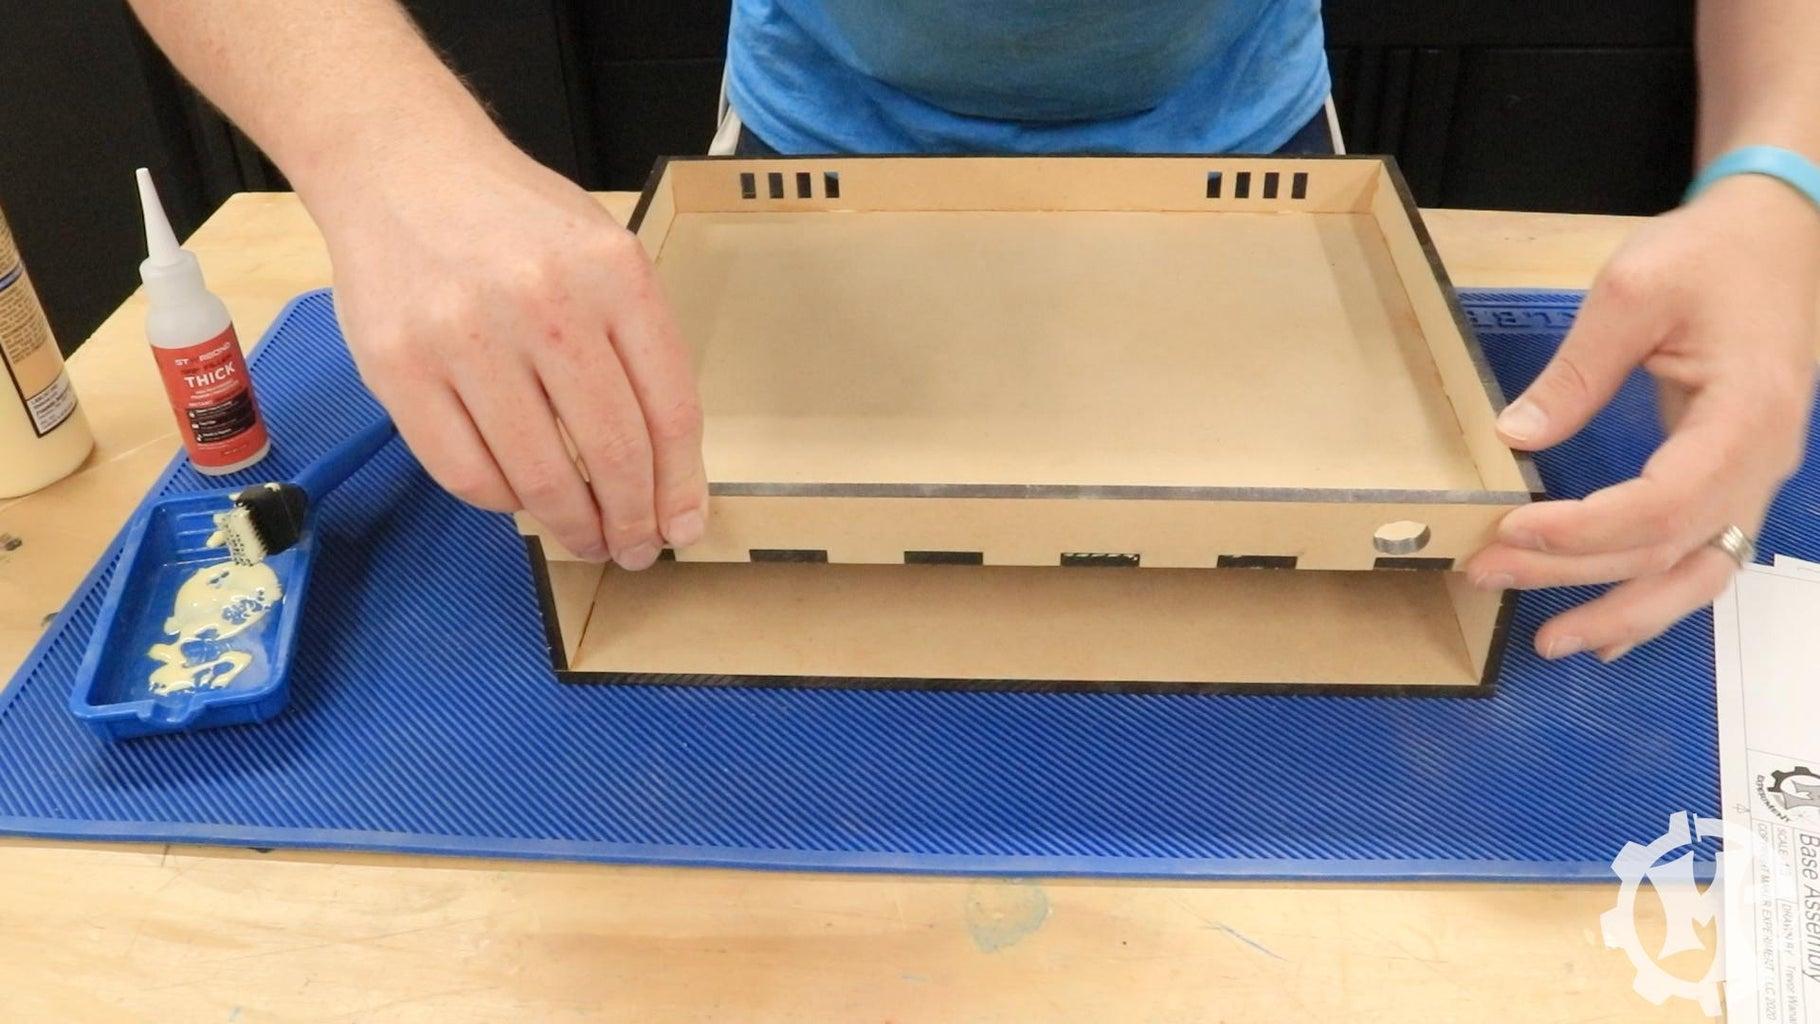 Assemble the Box - Base Assembly